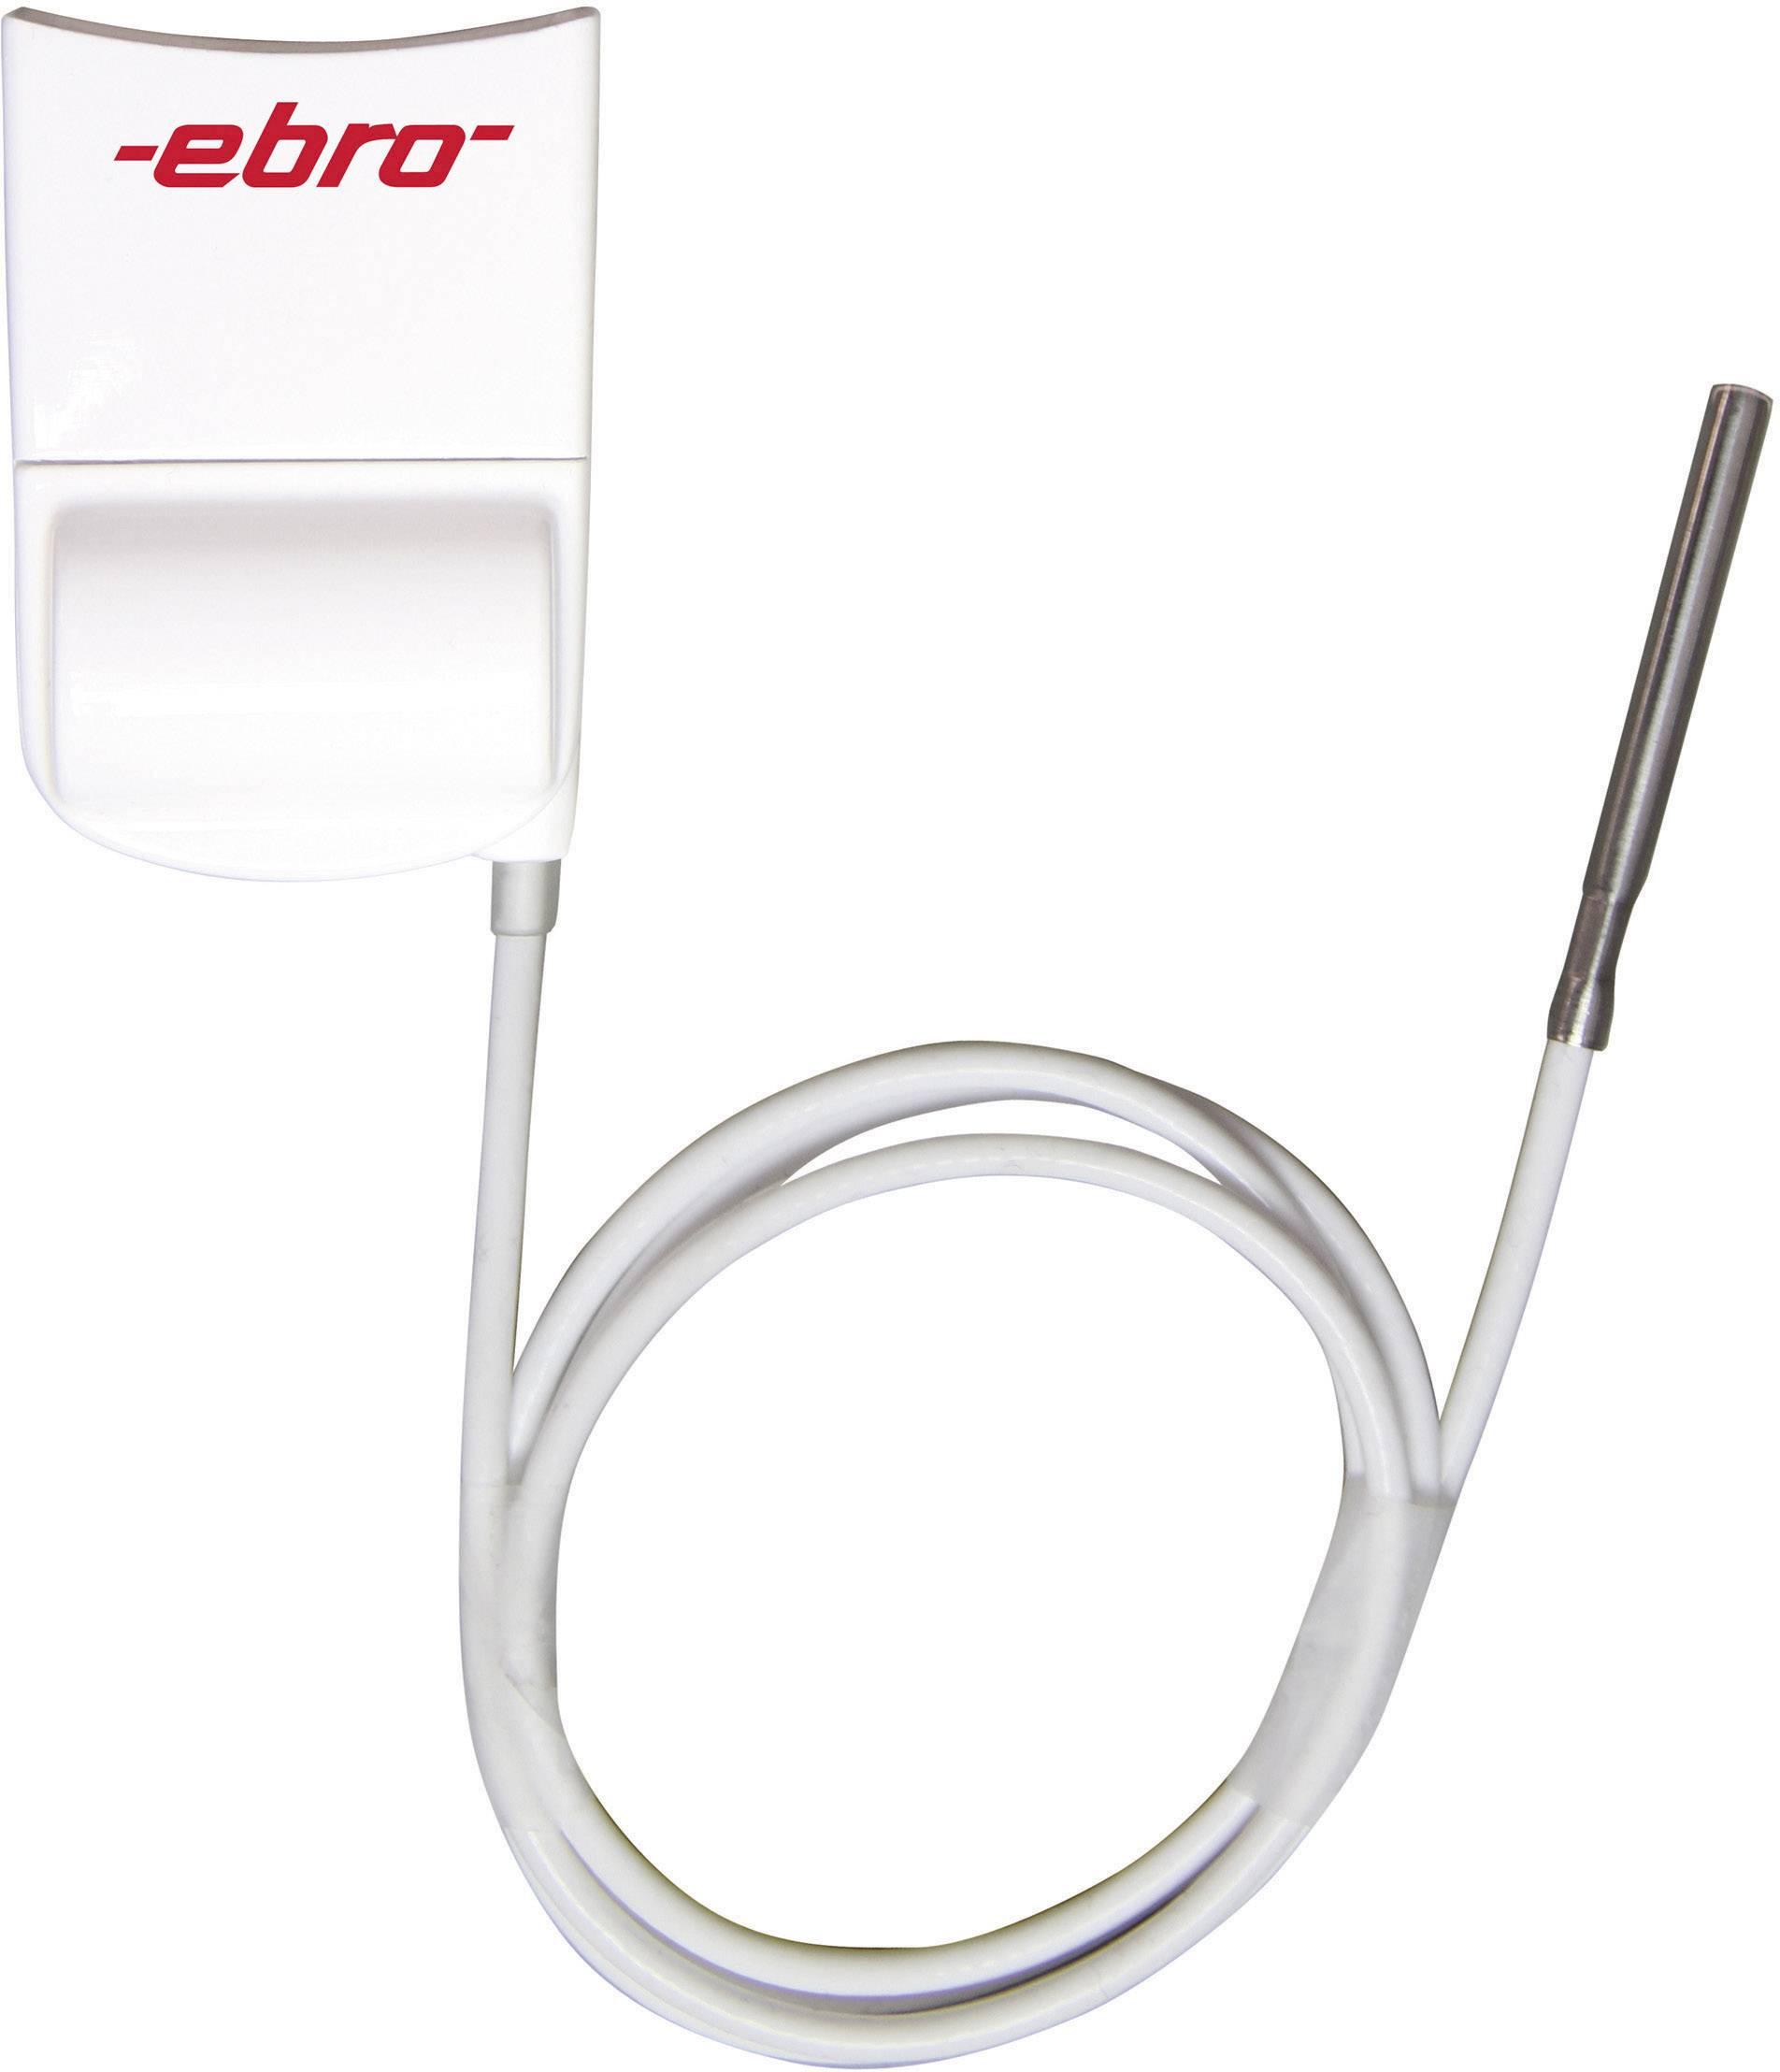 Teplotné čidlo ebro TPX 250, -85 až 50 °C